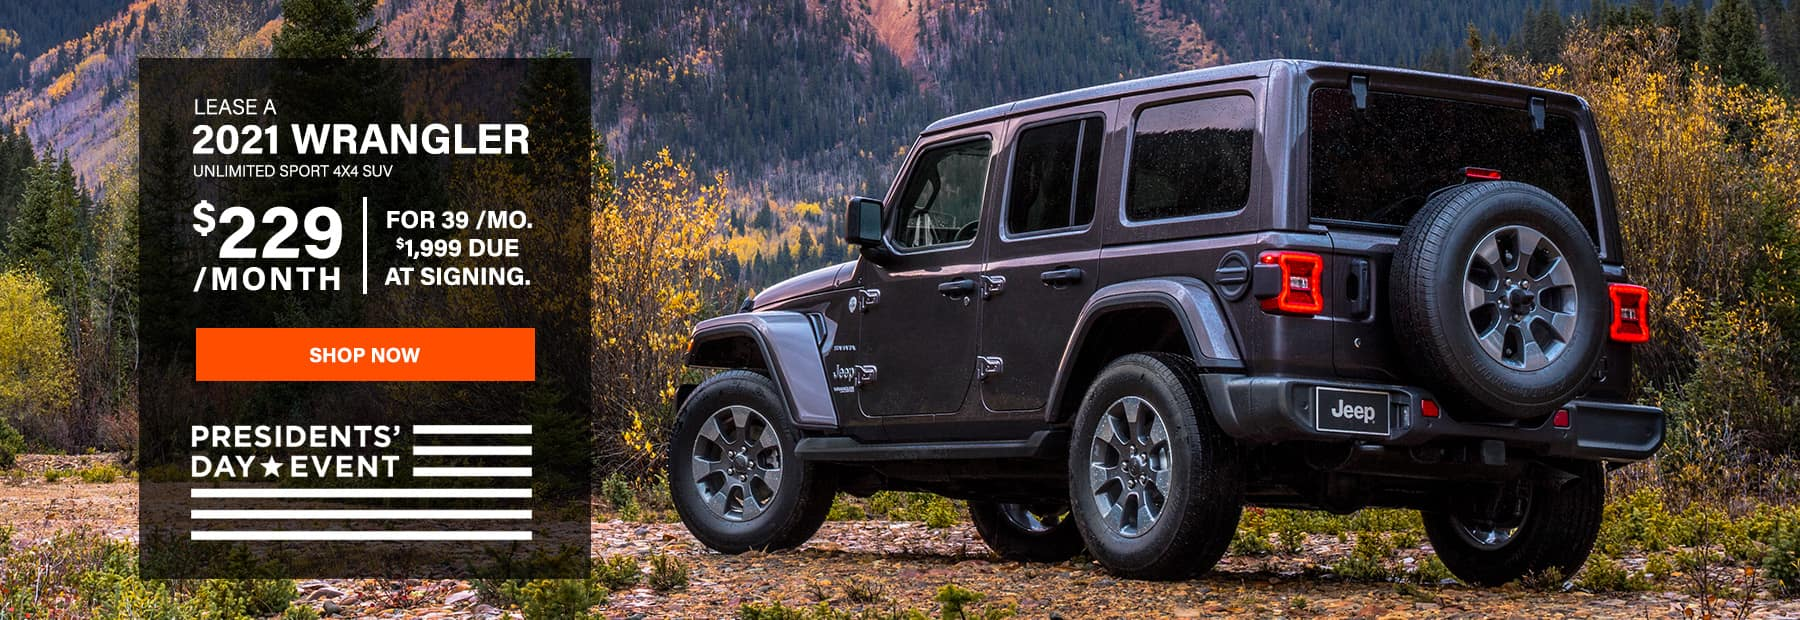 2021-02-03 Jeep Wrangler Desktop